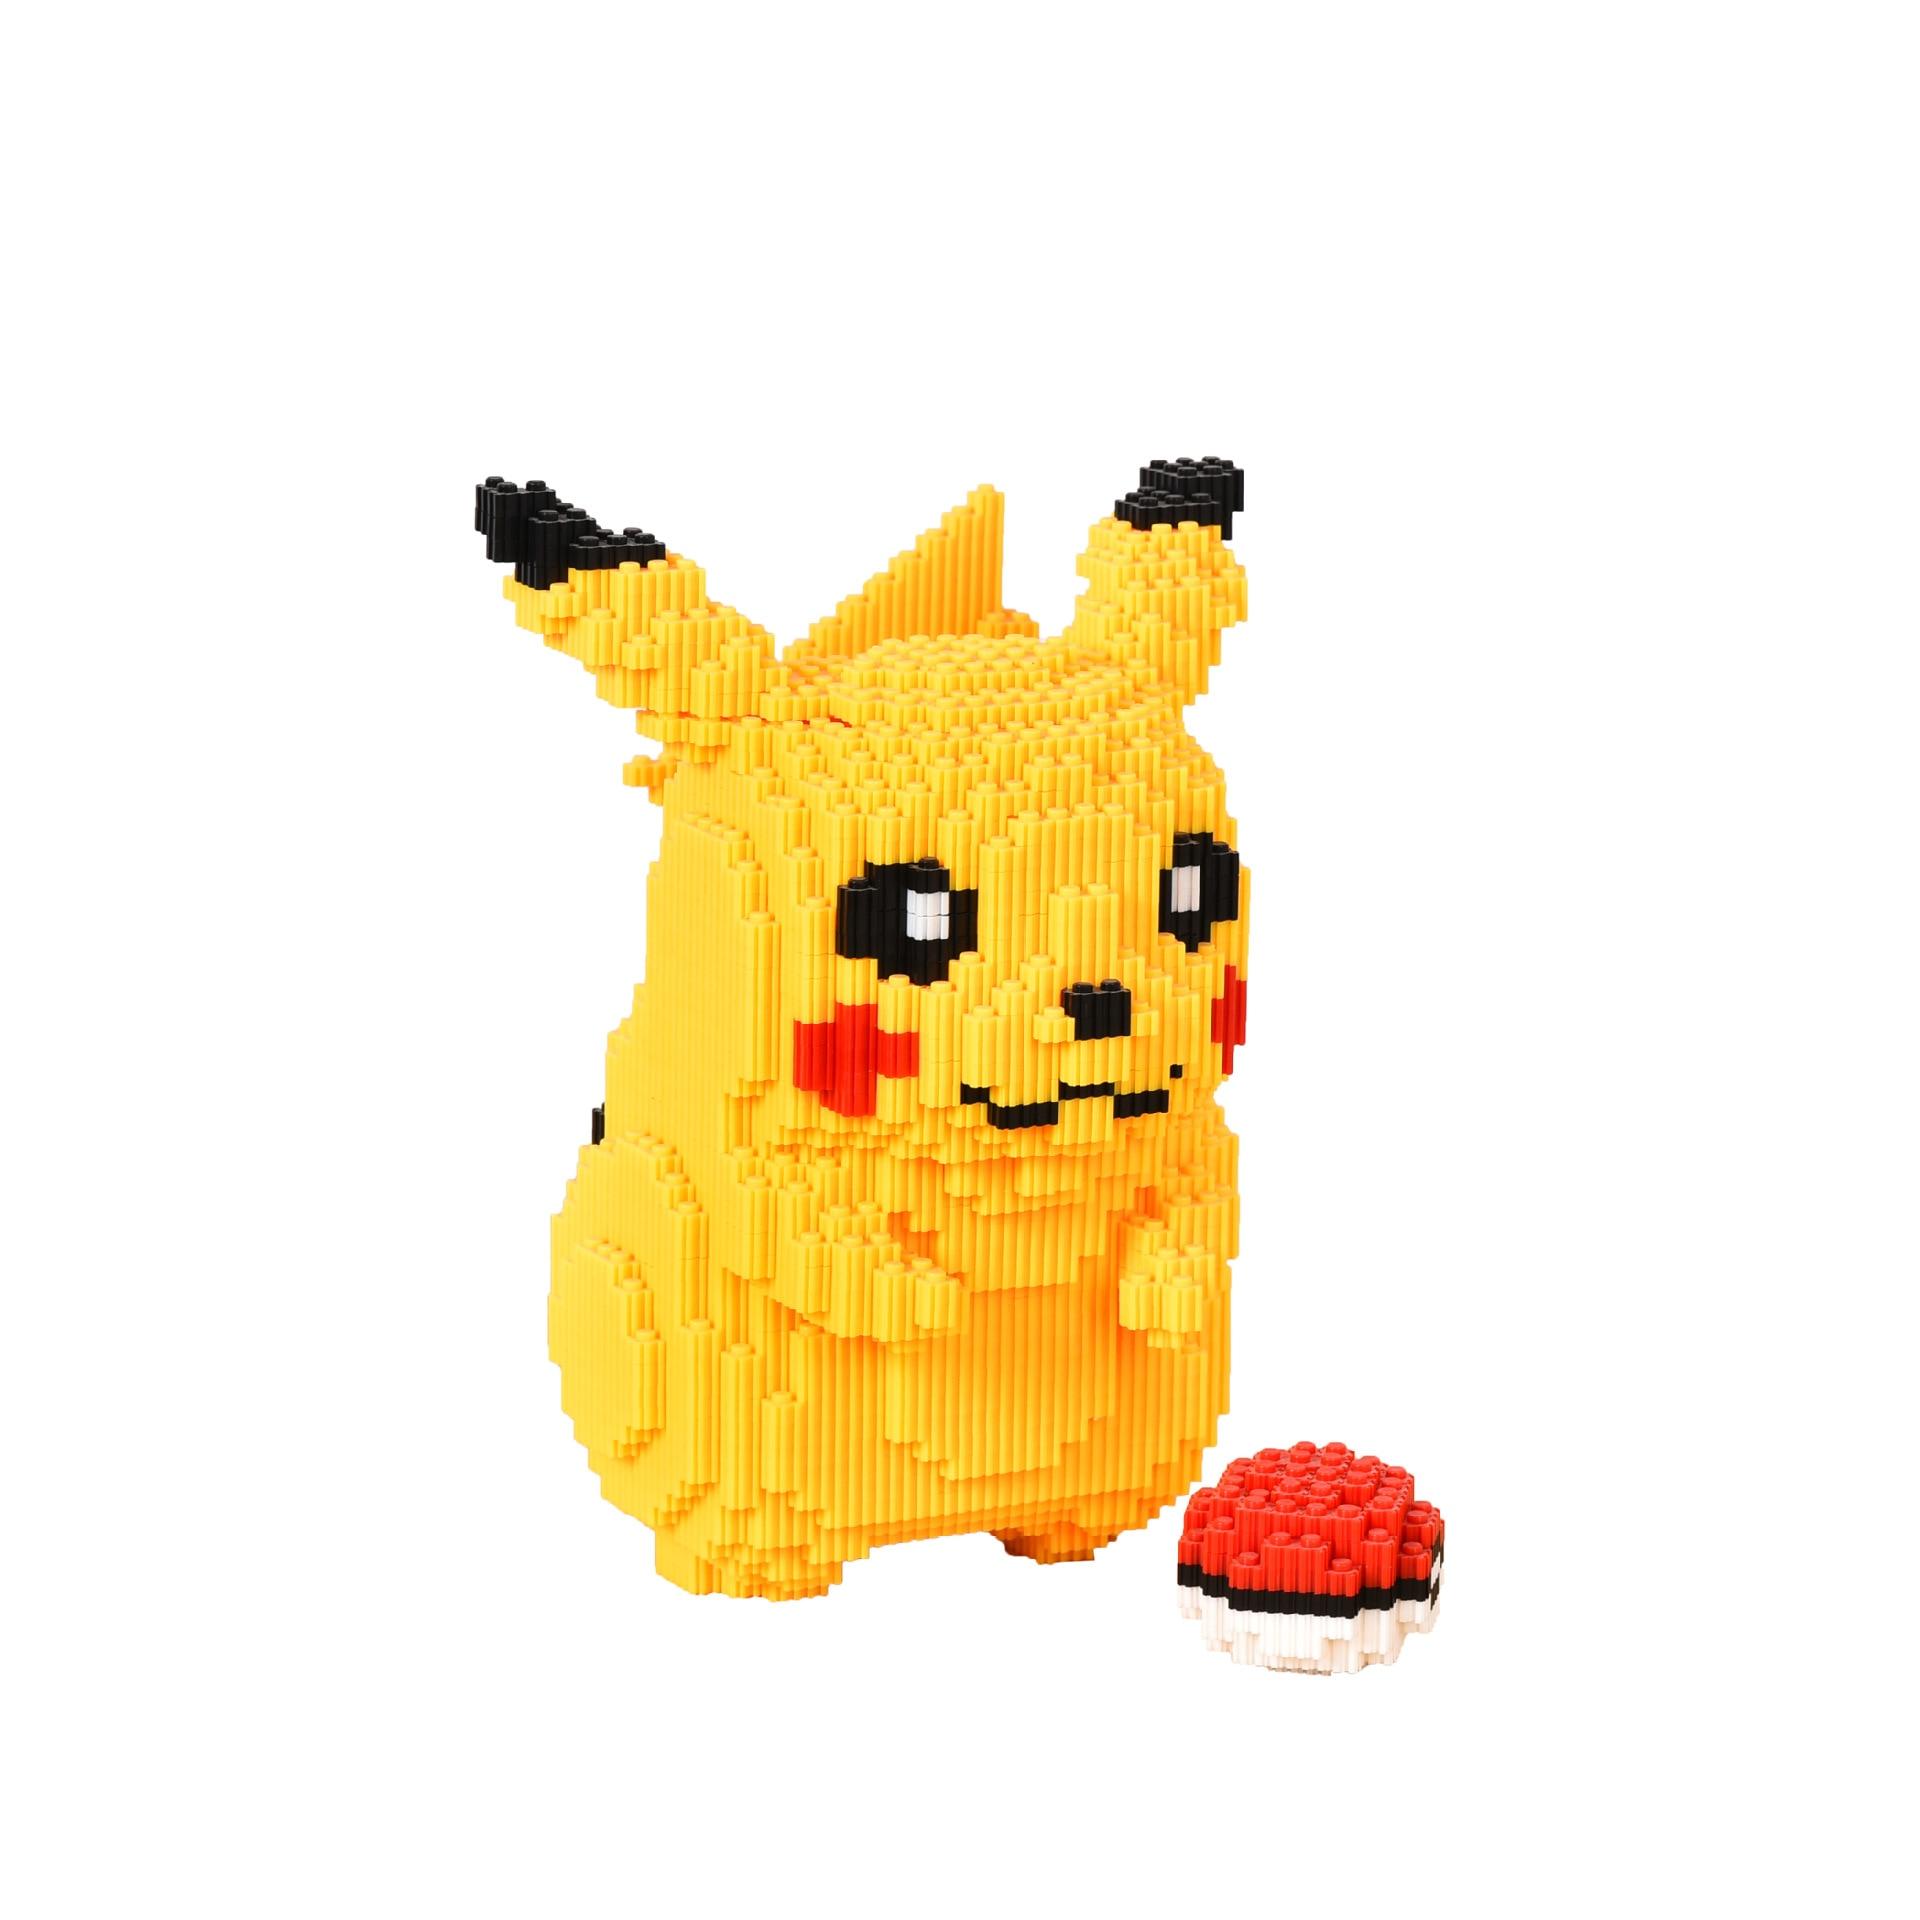 5210pcs Magic Blocks Cute Anime Pikachu 3D Building Block Decoration Children's Puzzle DIY Creative Building Block Toy